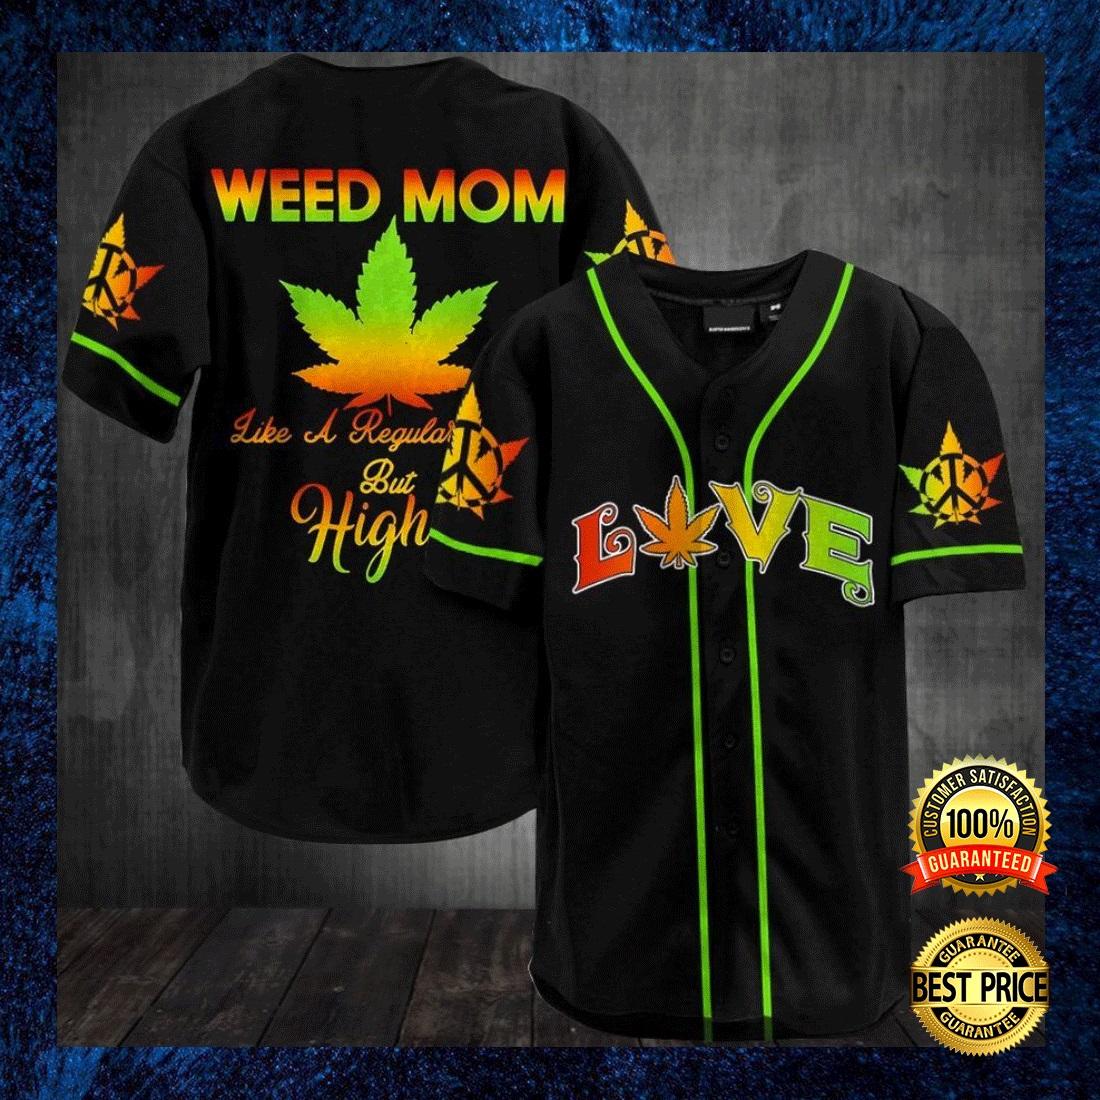 WEED MOM LIKE A REGULAR MOM BUT HIGHER BASEBALL JERSEY 7